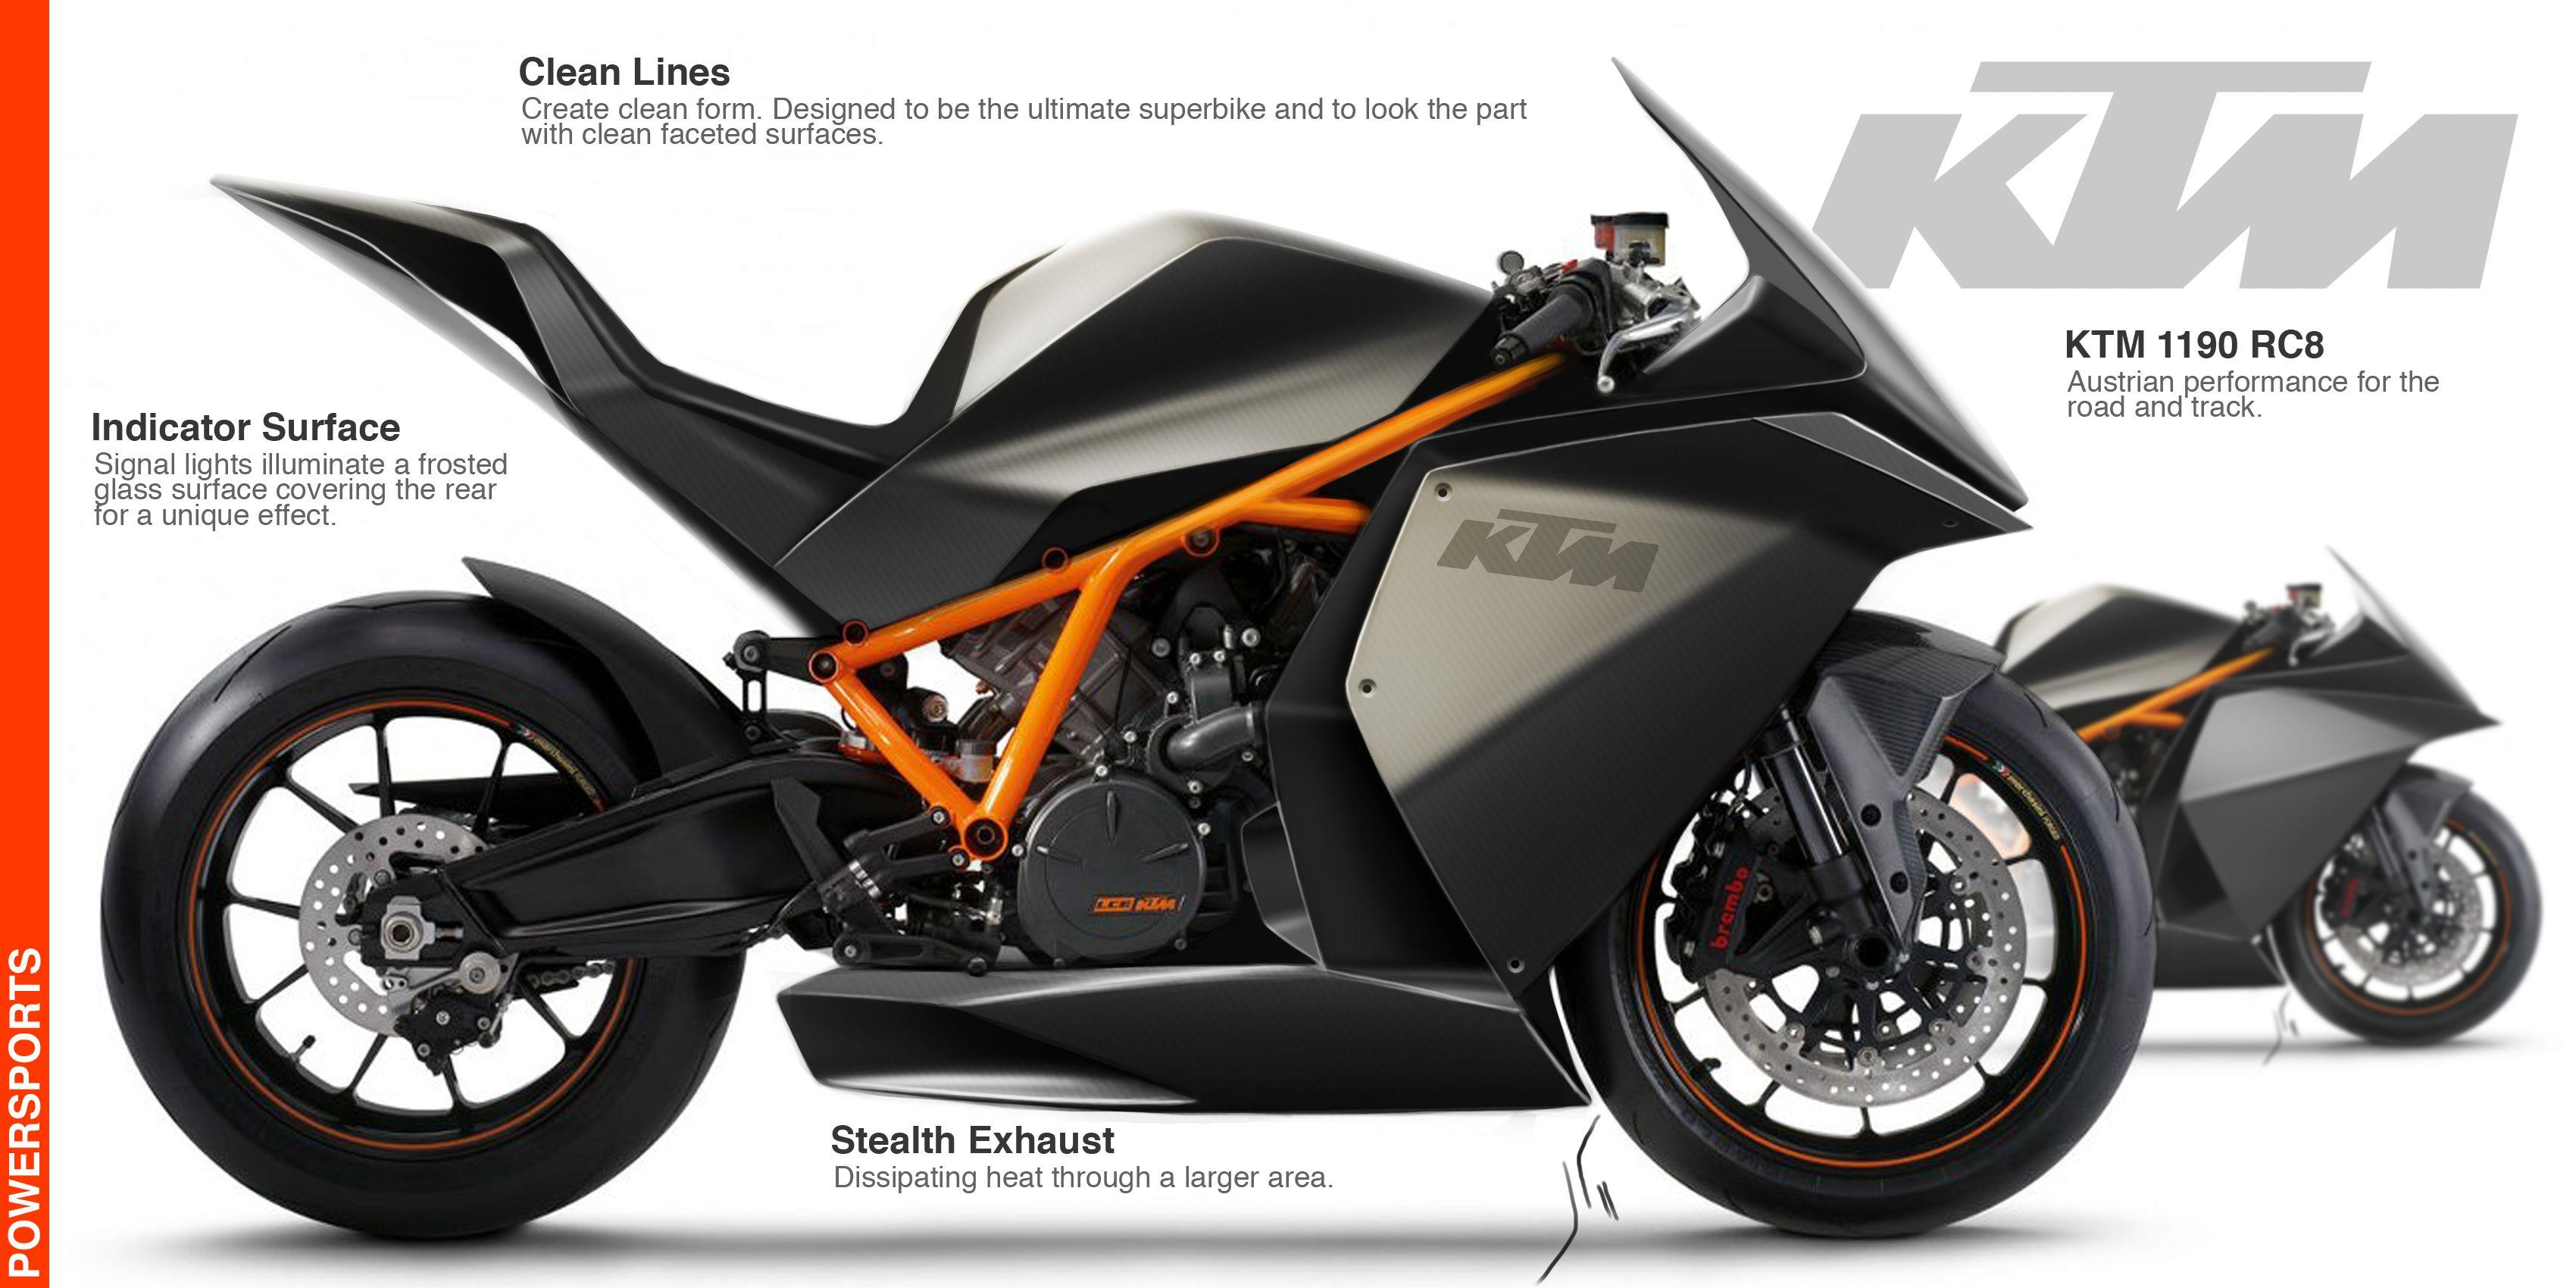 ktm 1190 rc8 | motorbikes design | pinterest | motorbikes